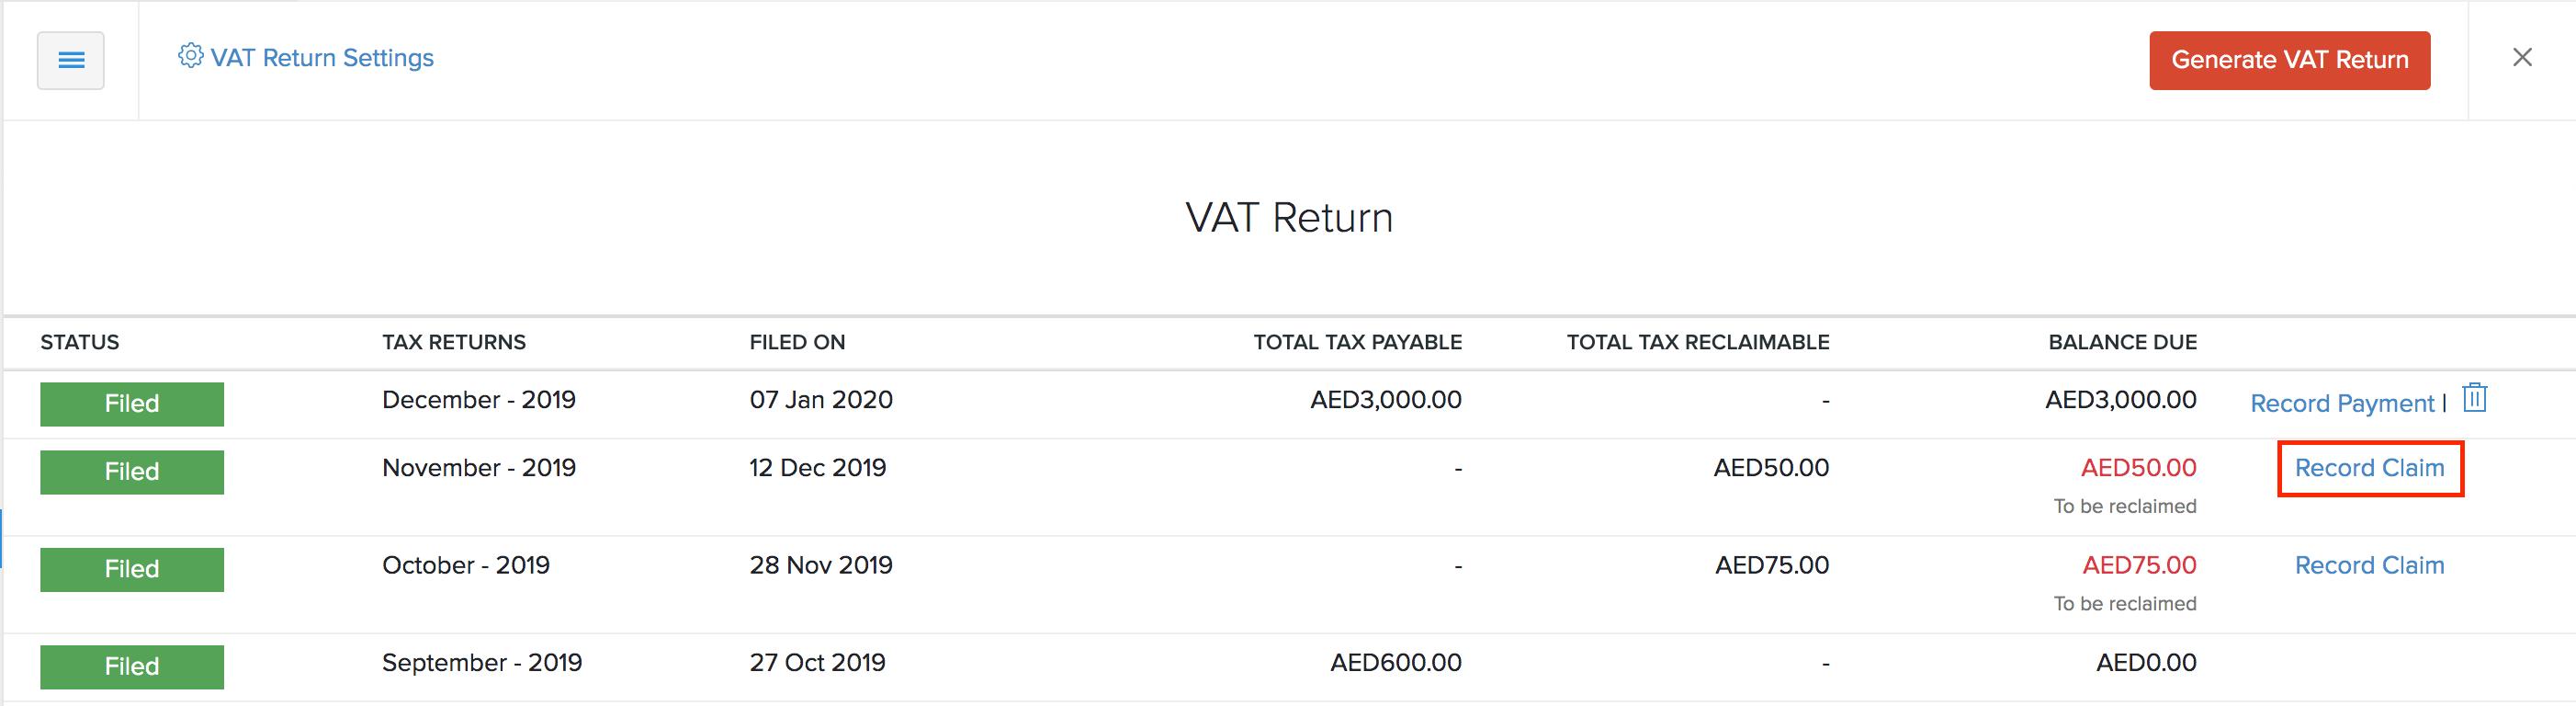 Tax Claim